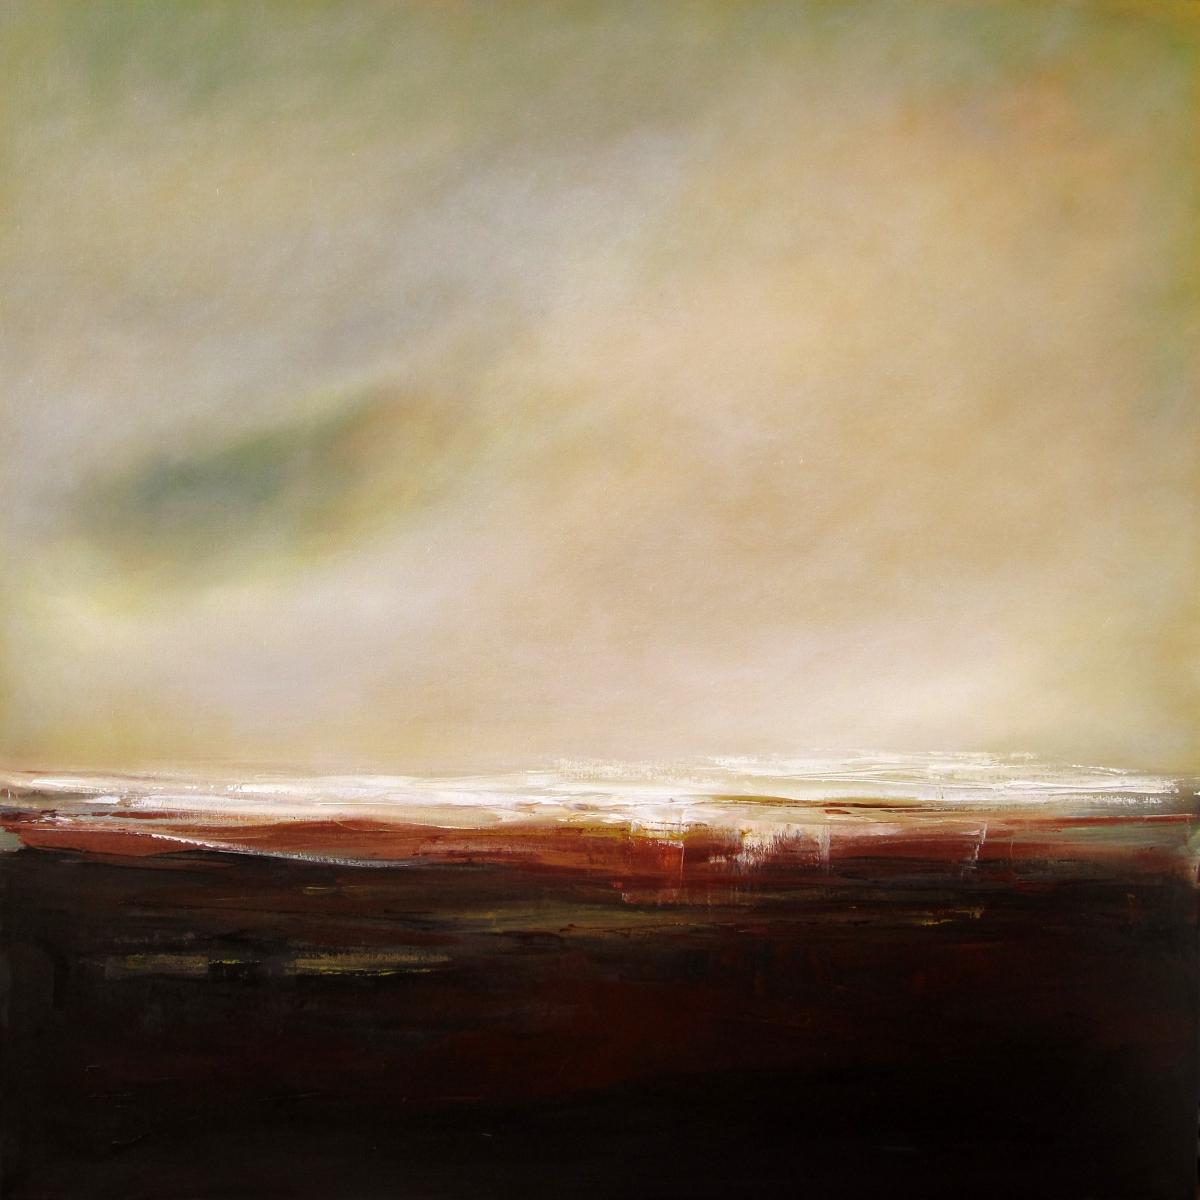 El Peso De La Luz, Estudio #3 (The Weight of Light, Study#3),oil painting on canvas by Marta Fuster Barutell